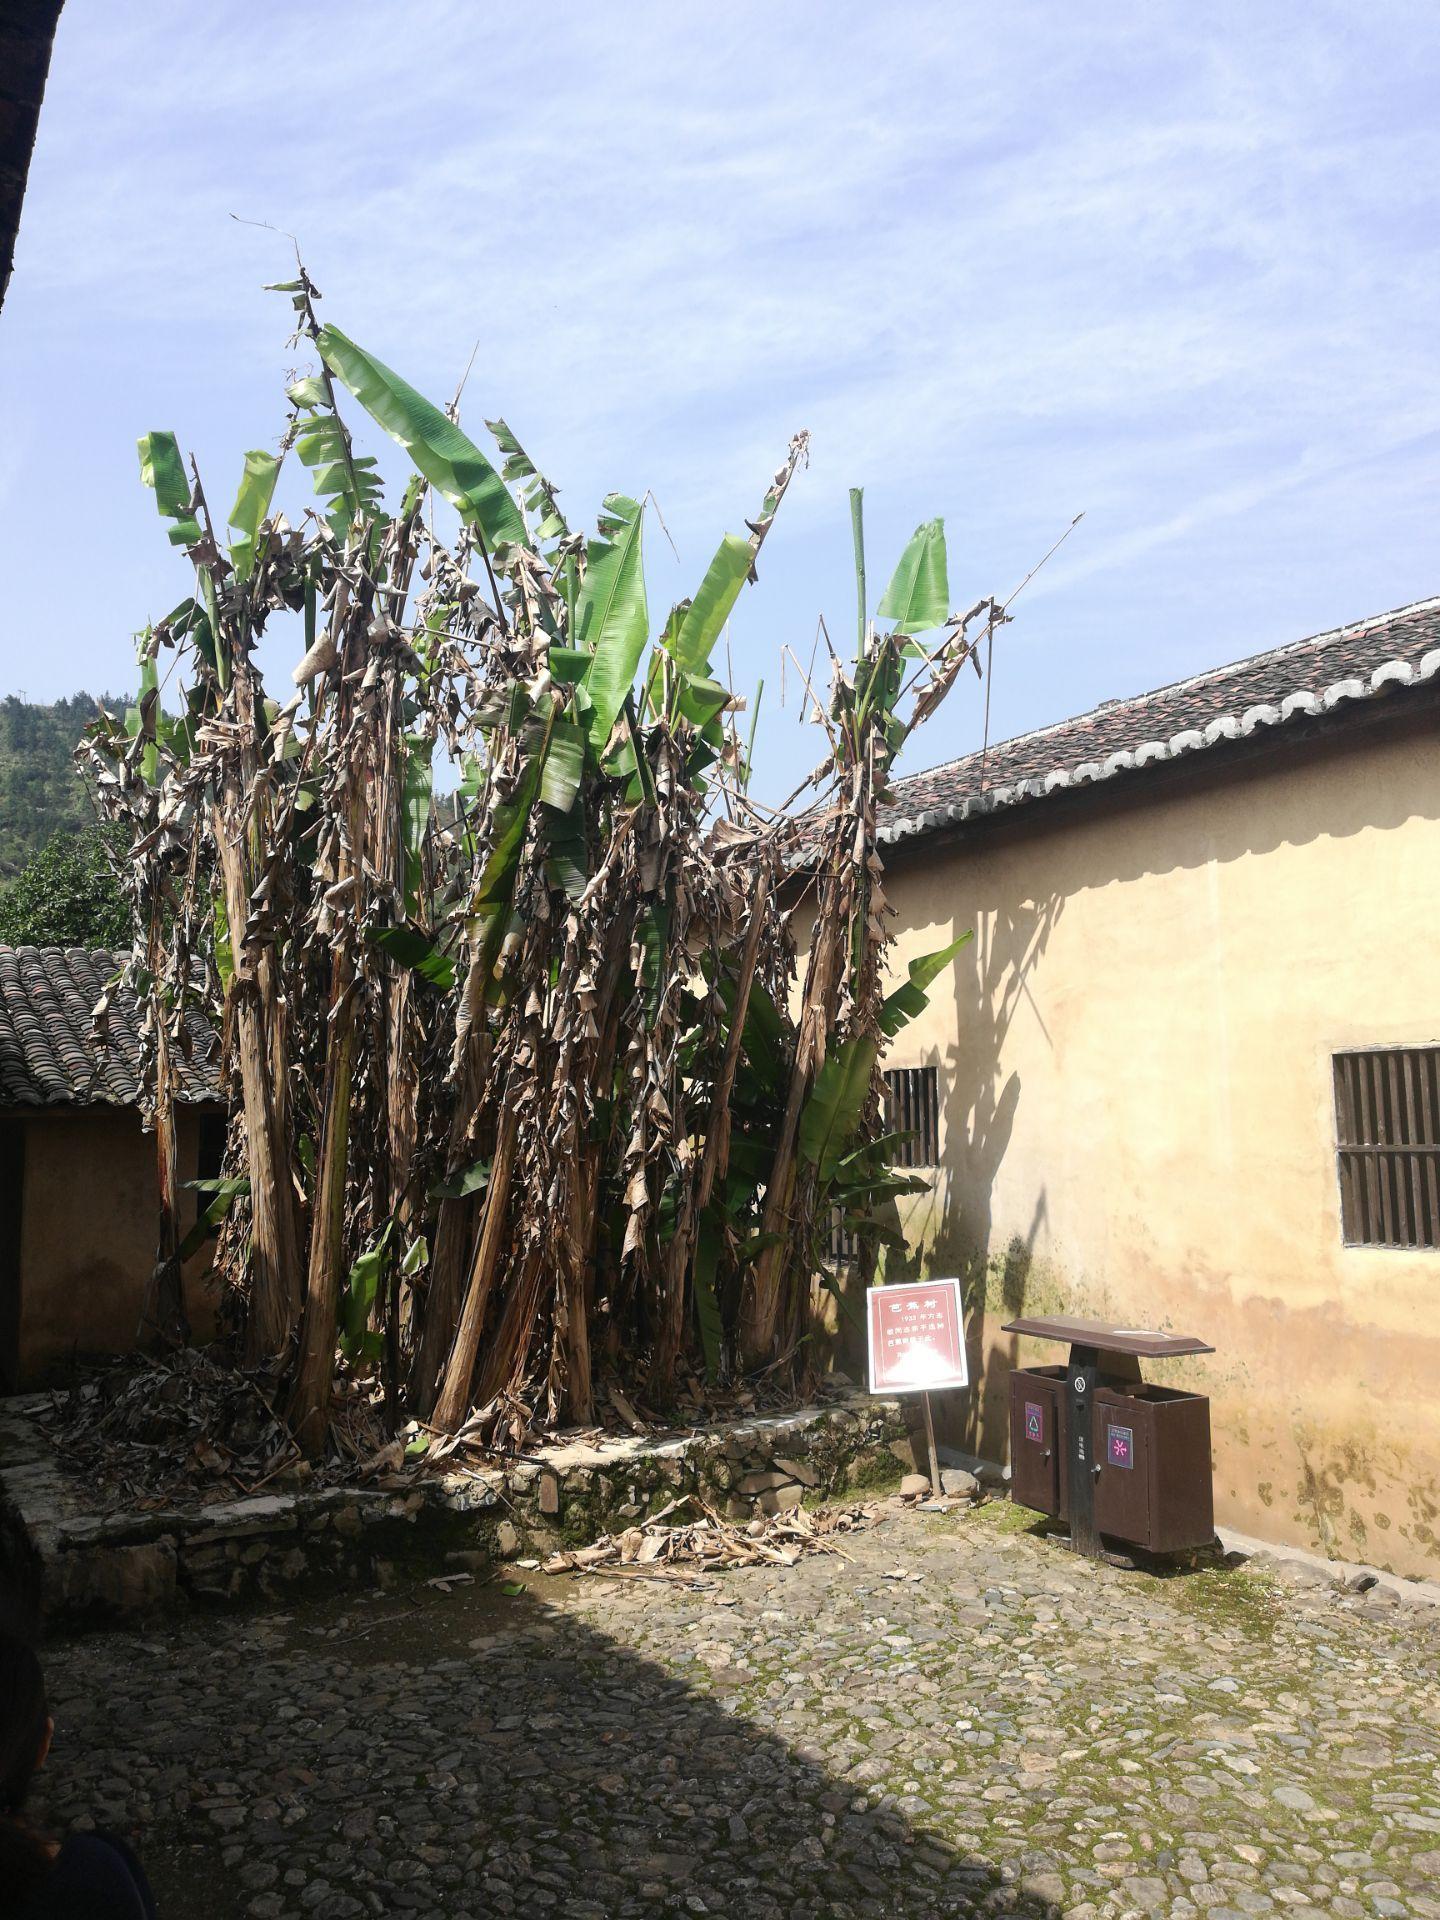 Minzhe Wangan Revolution Base Area Memorial Hall